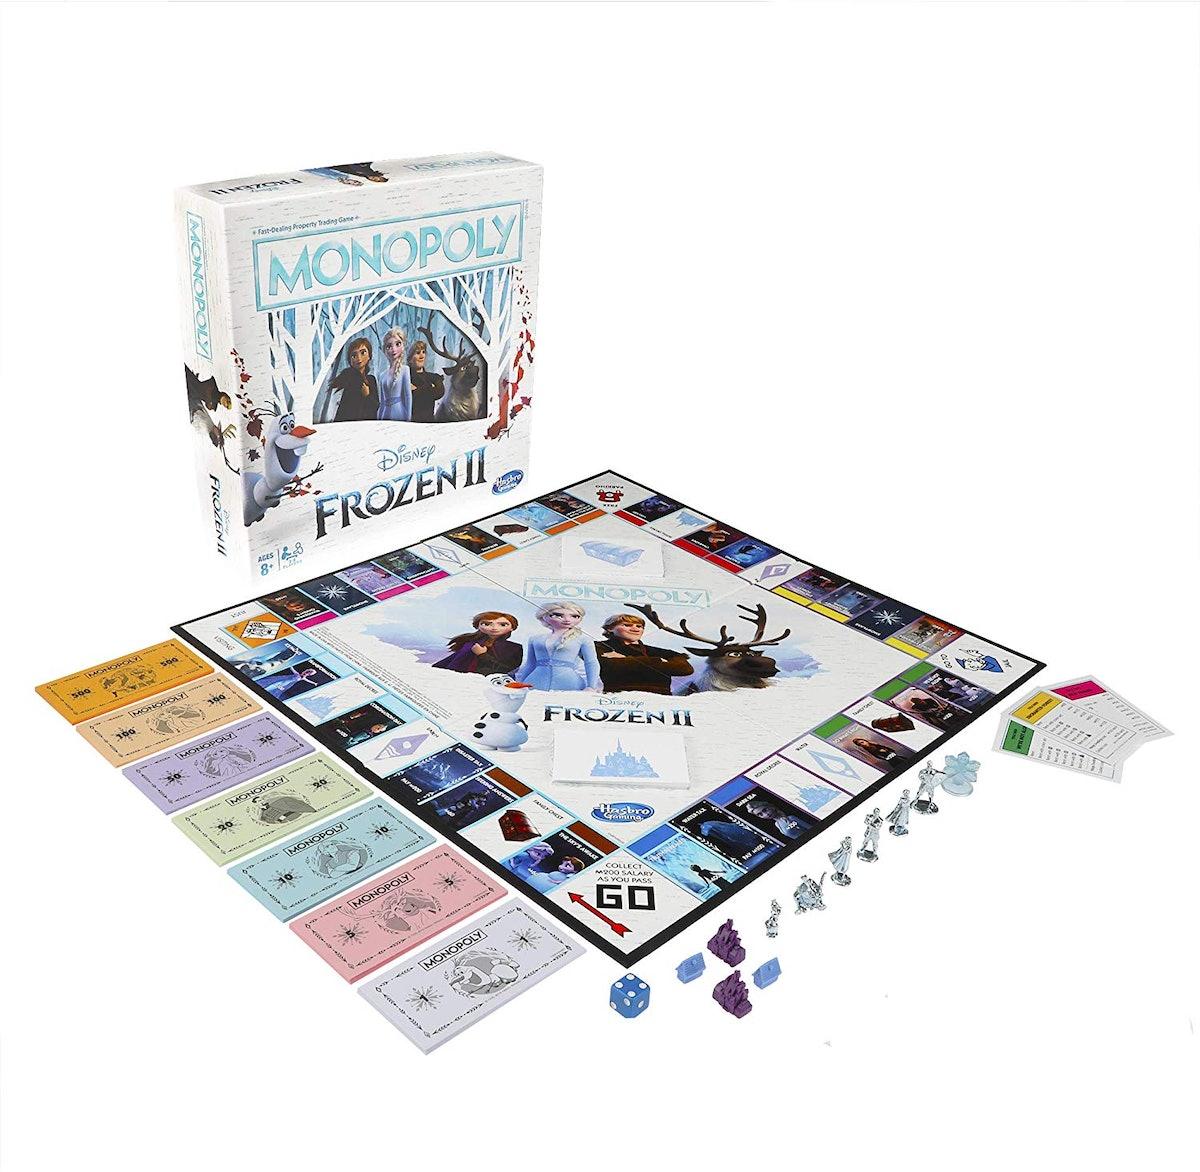 Monopoly Game: Disney 'Frozen 2' Edition